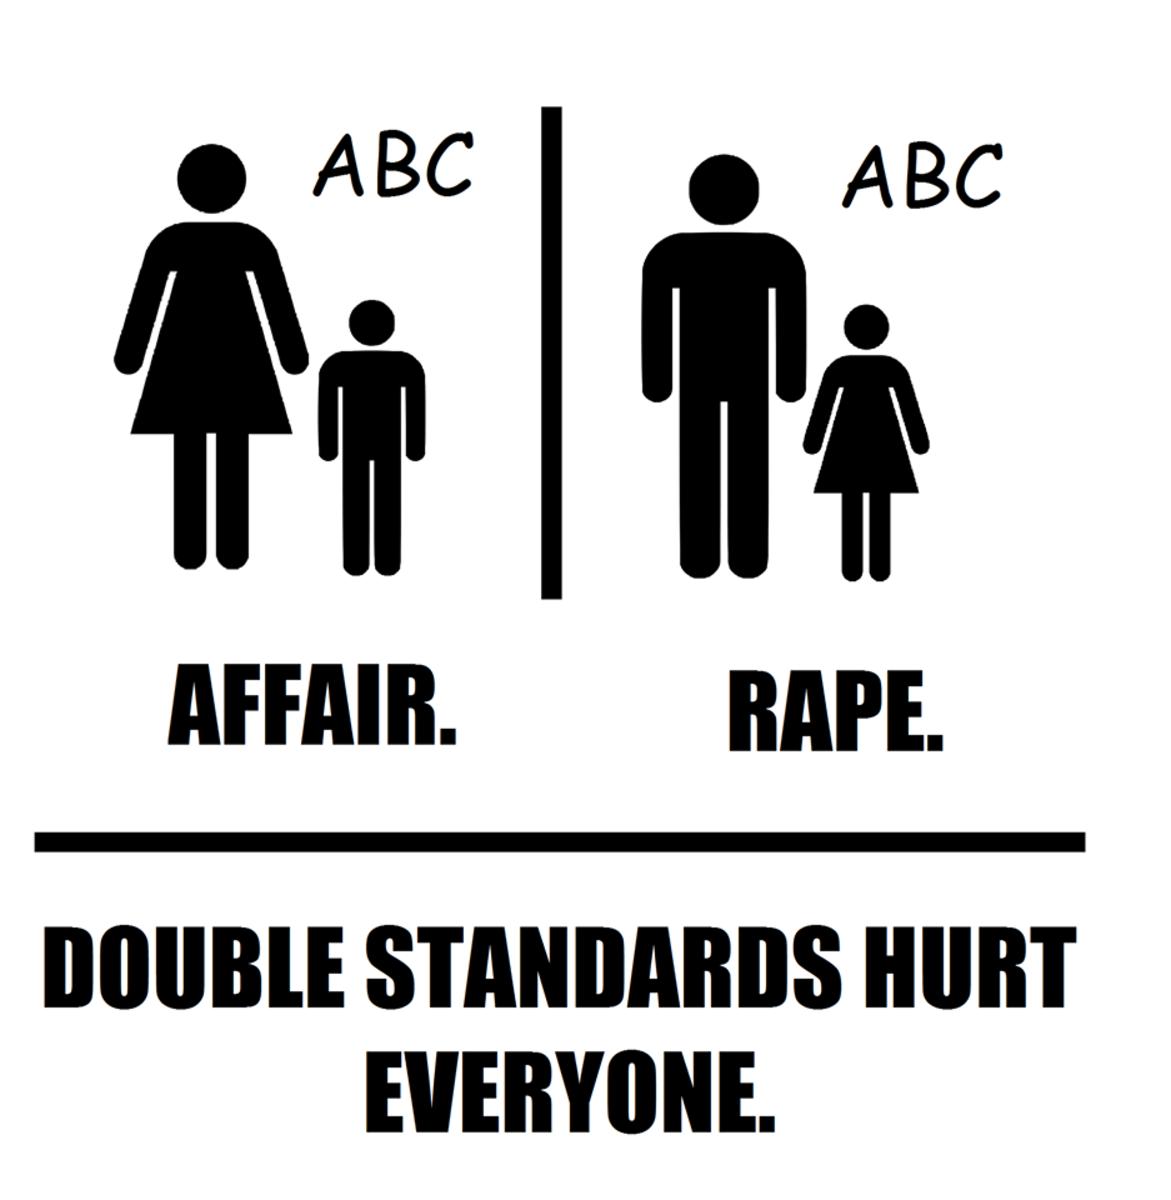 Rape Quotes Rape Culture Female Rapists And The Rape Of Men And Boys  Hubpages